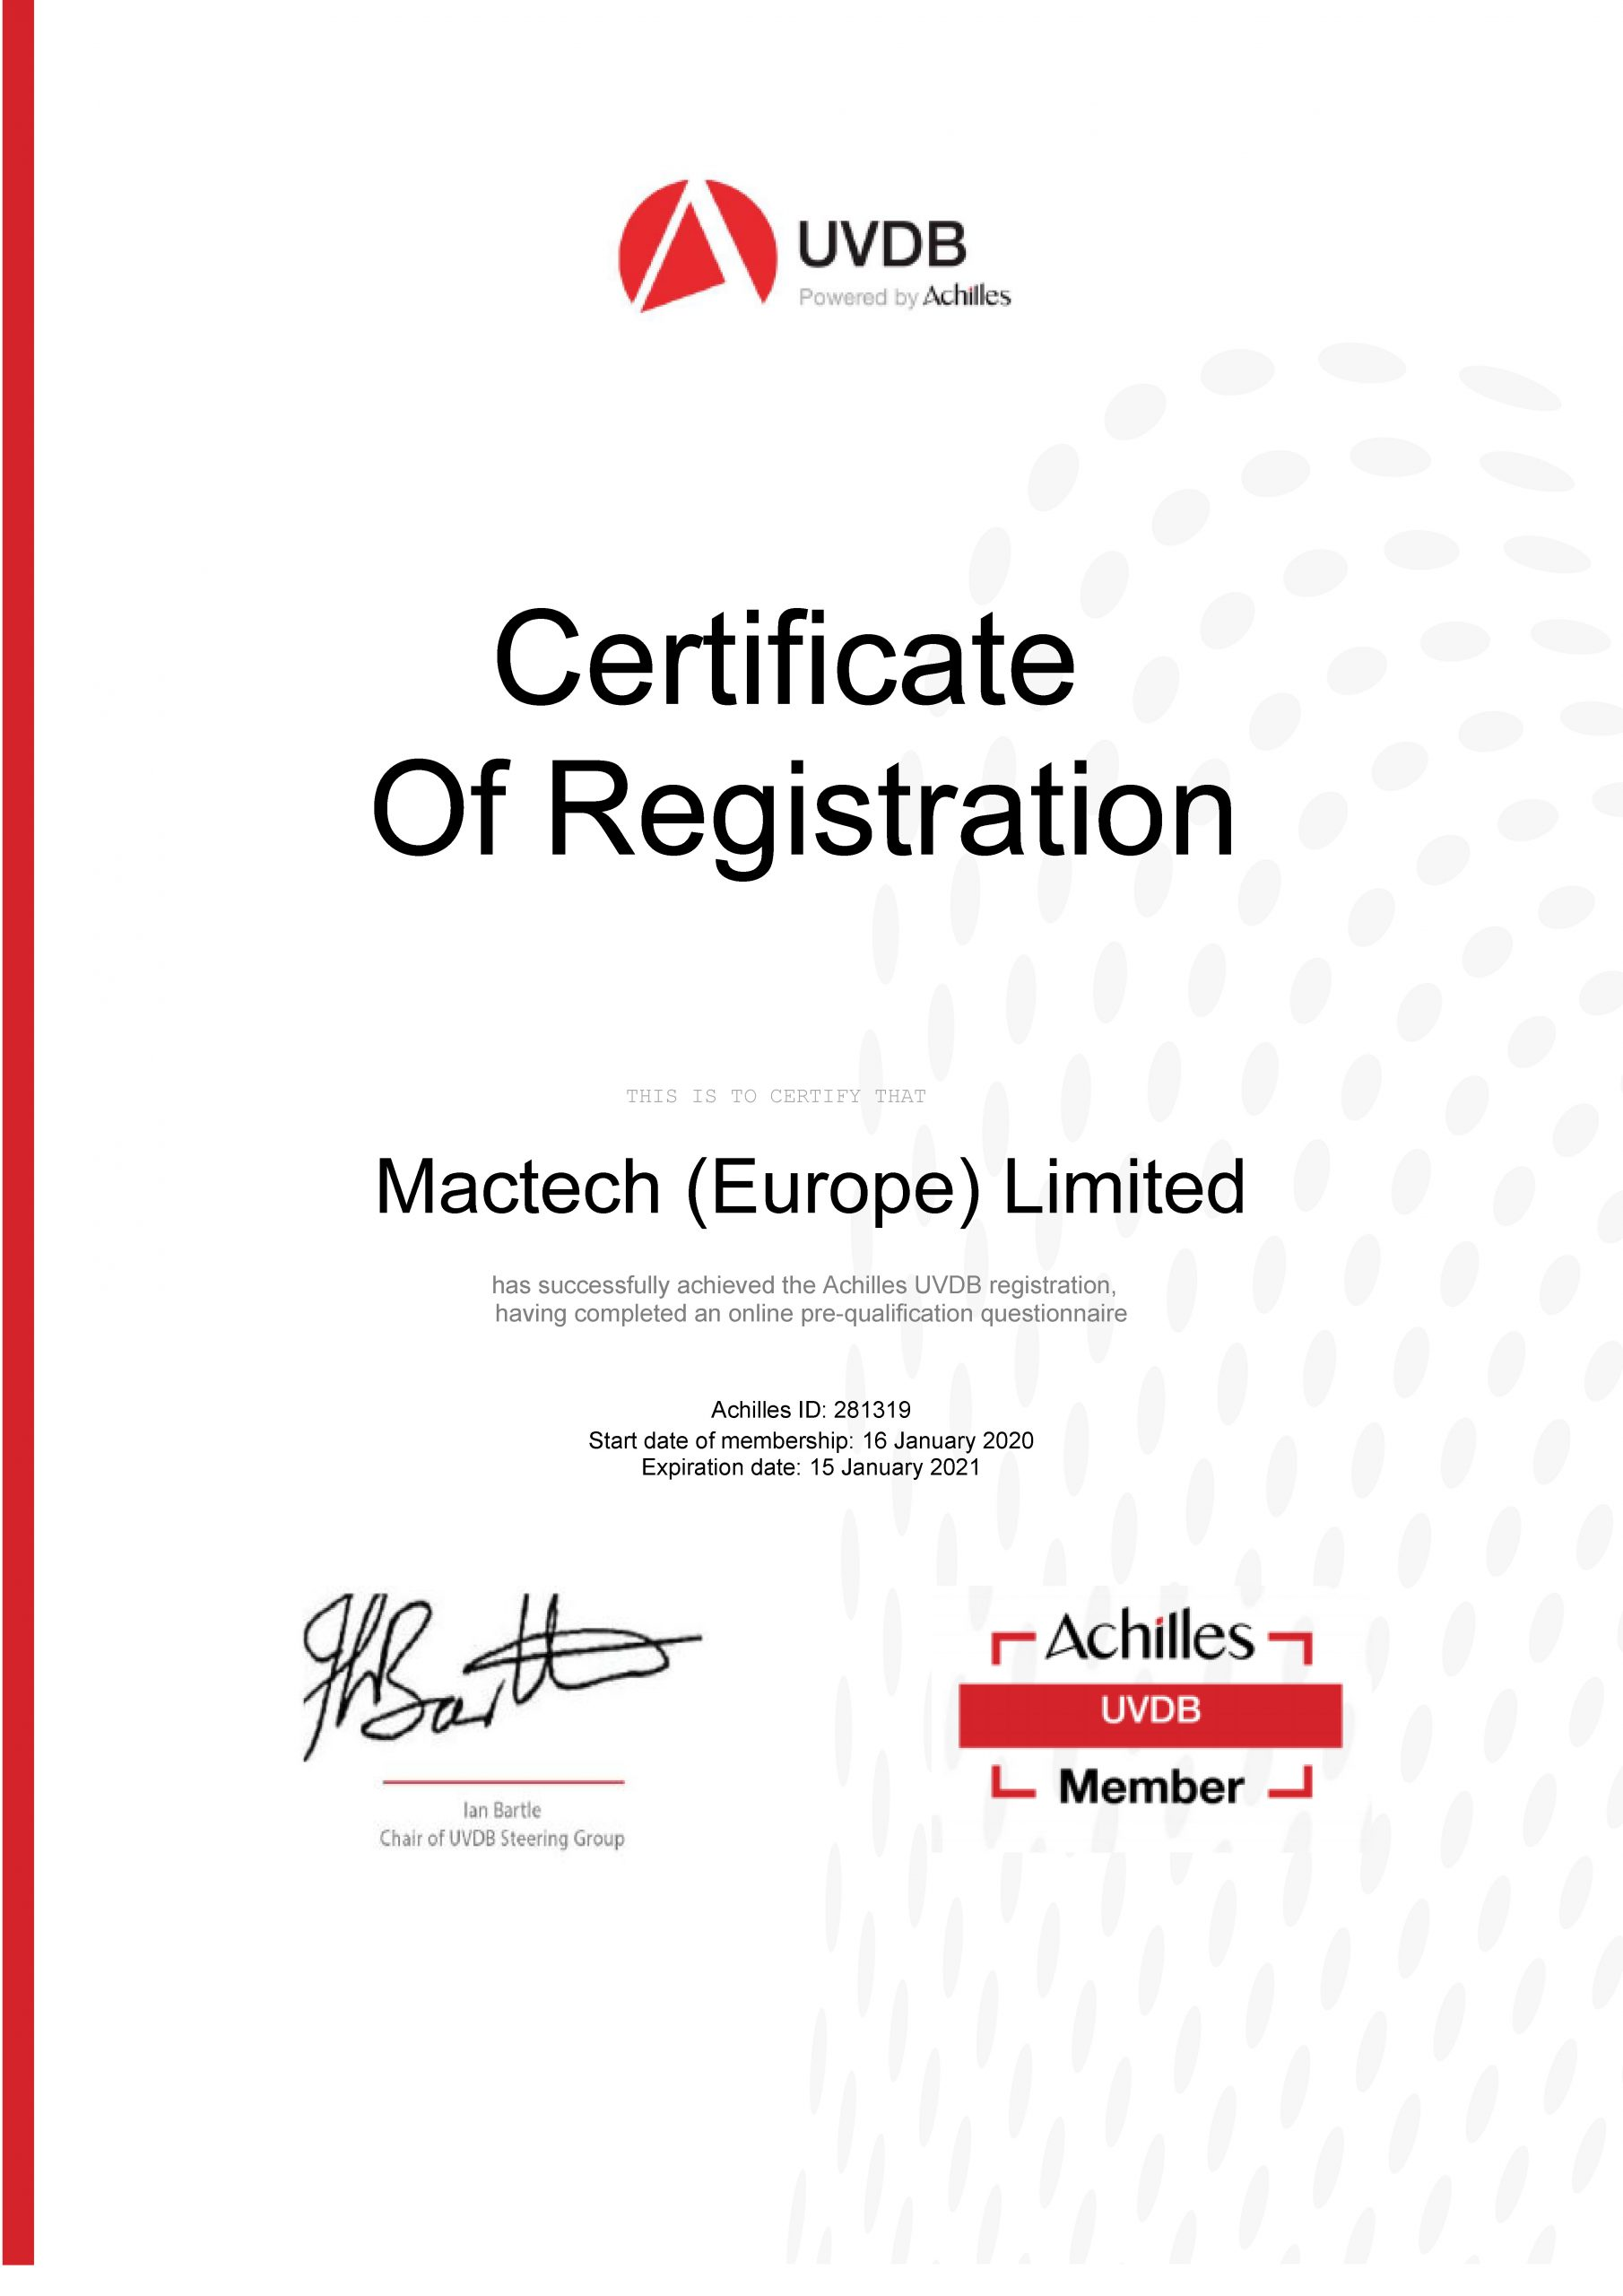 Achilles UVDB Certificate exp. 15.01.2021_Page_1